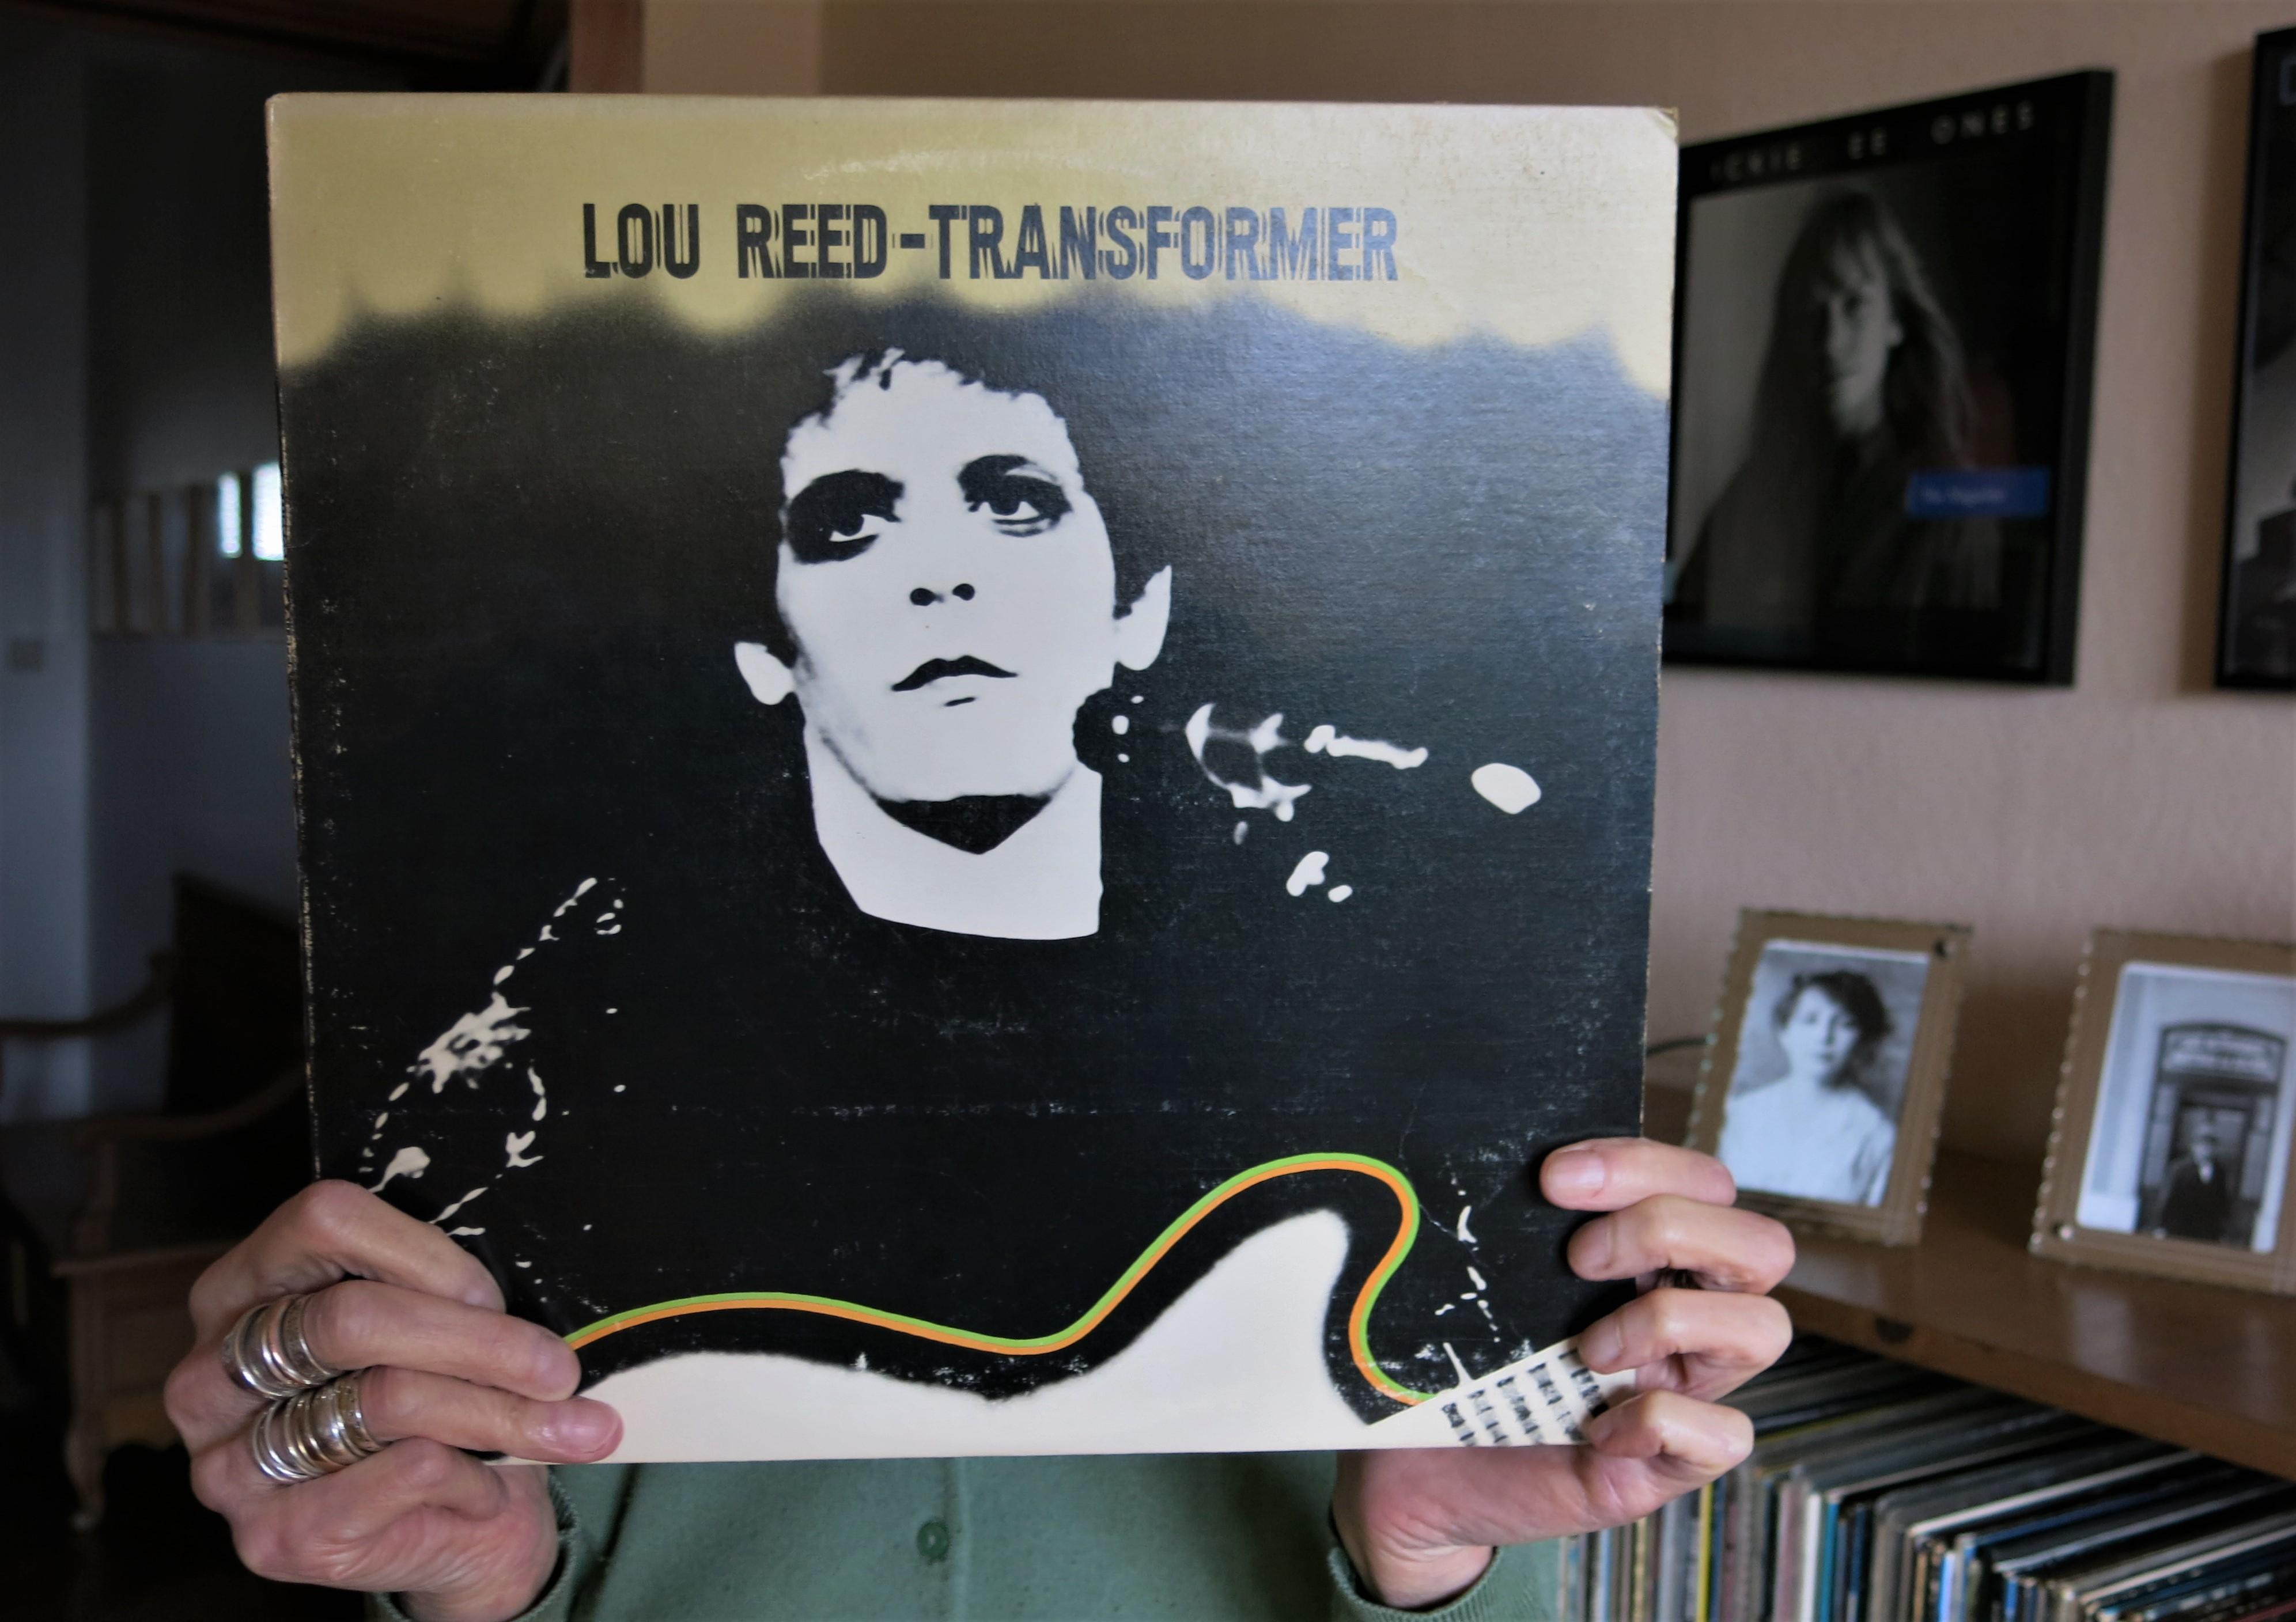 2020-07-03-transformer1